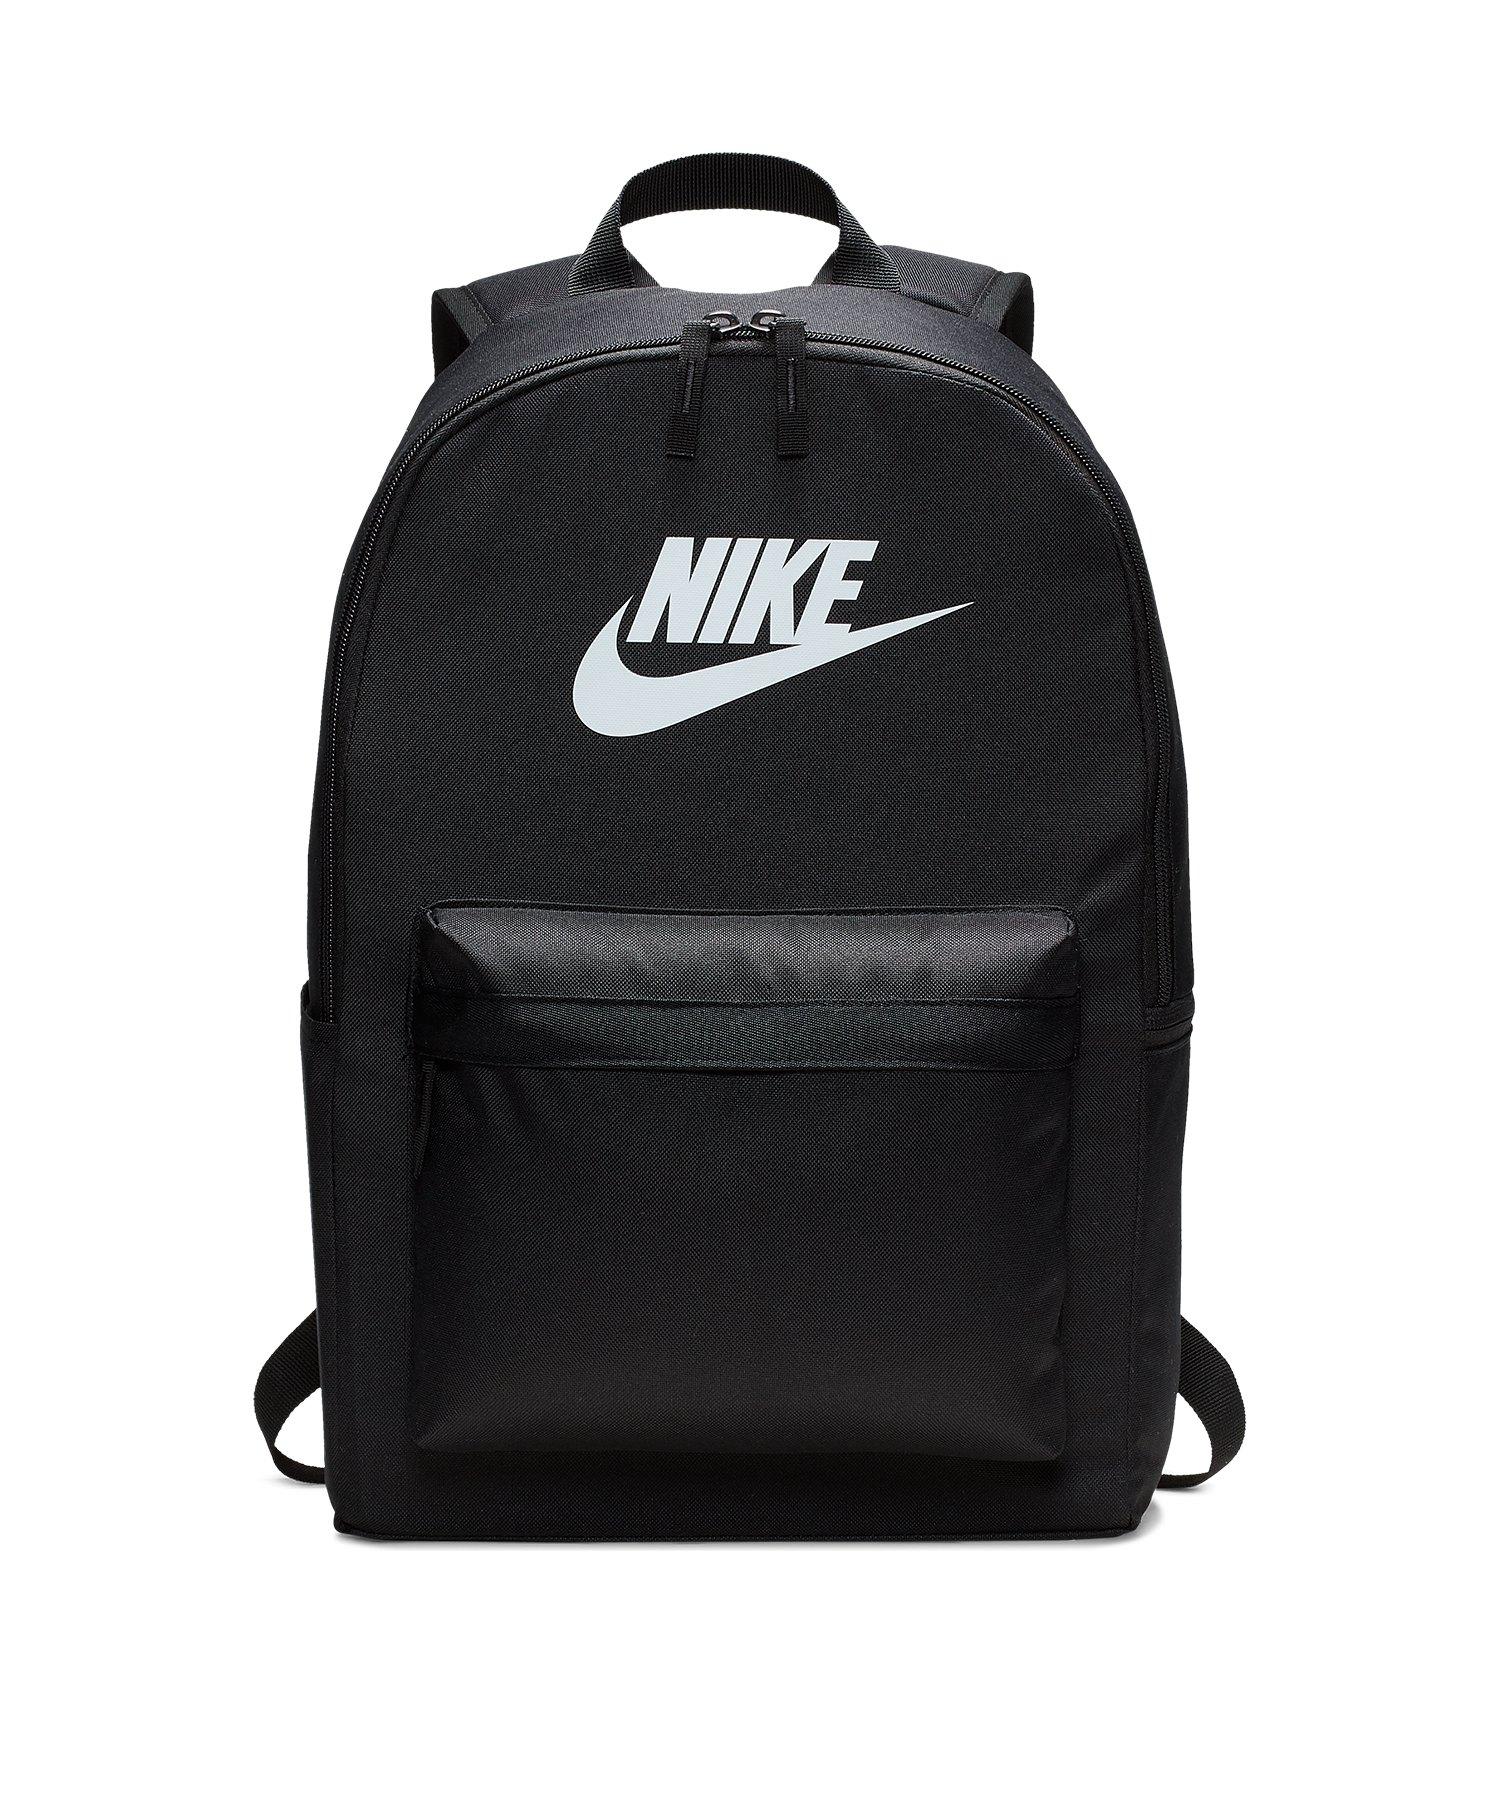 Nike Heritage 2.0 Backpack Rucksack Schwarz F011 - schwarz